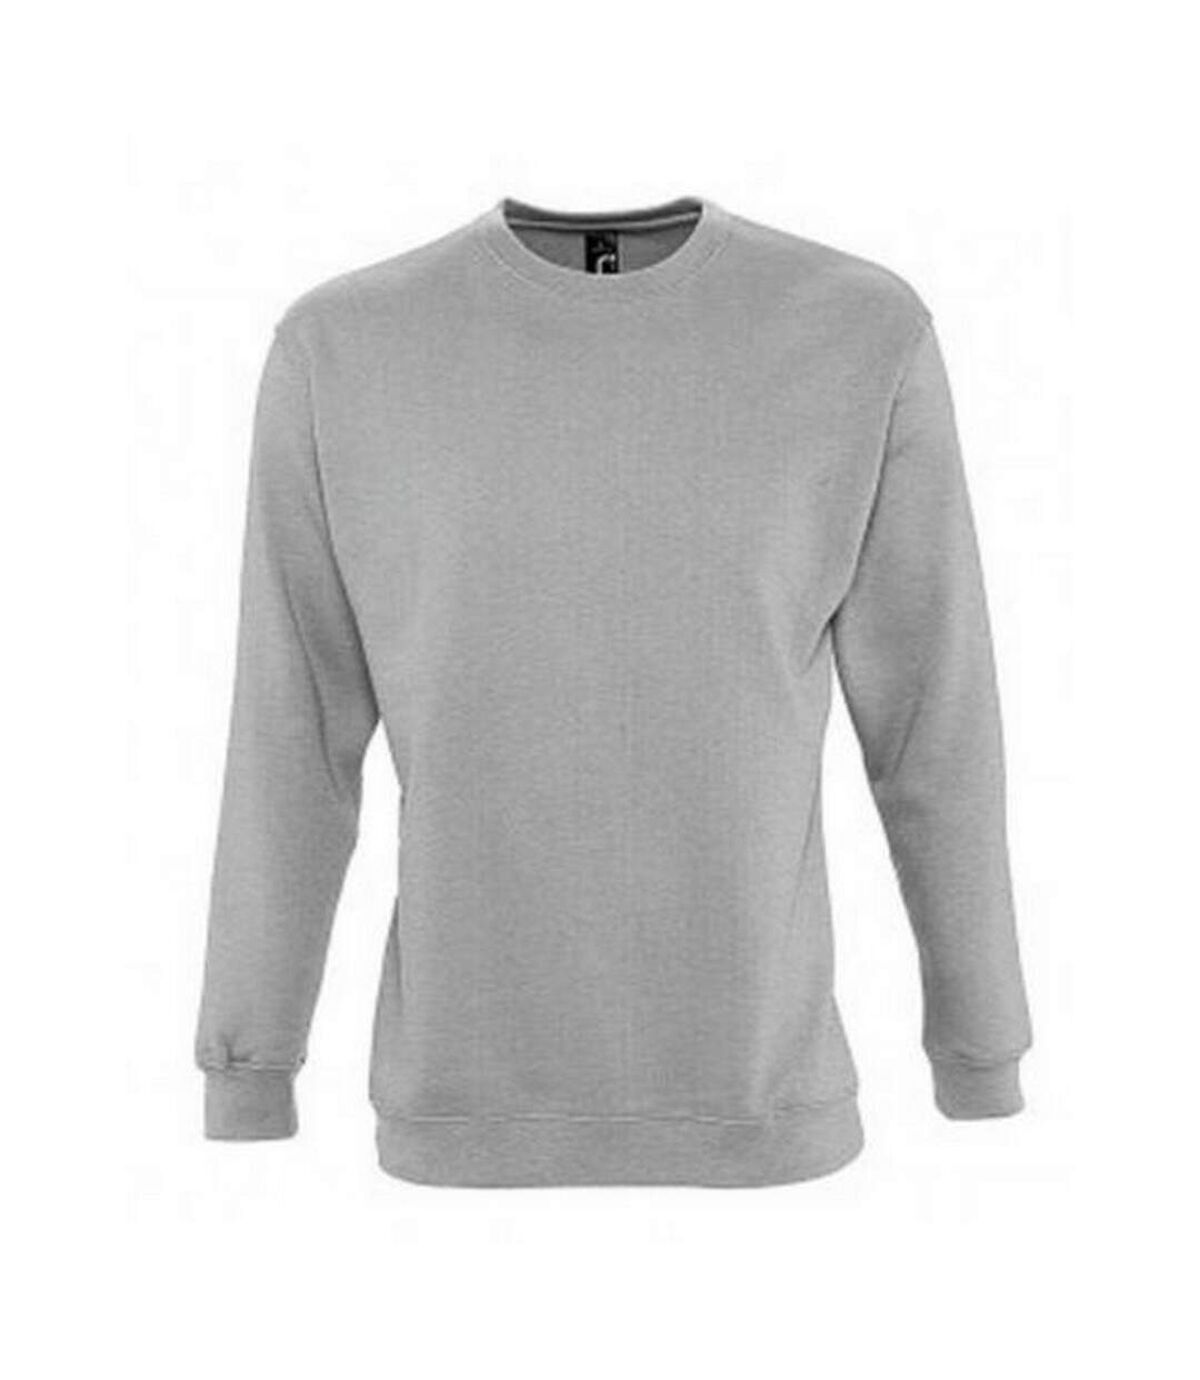 SOLS Supreme - Sweatshirt - Homme (Gris marne) - UTPC2415